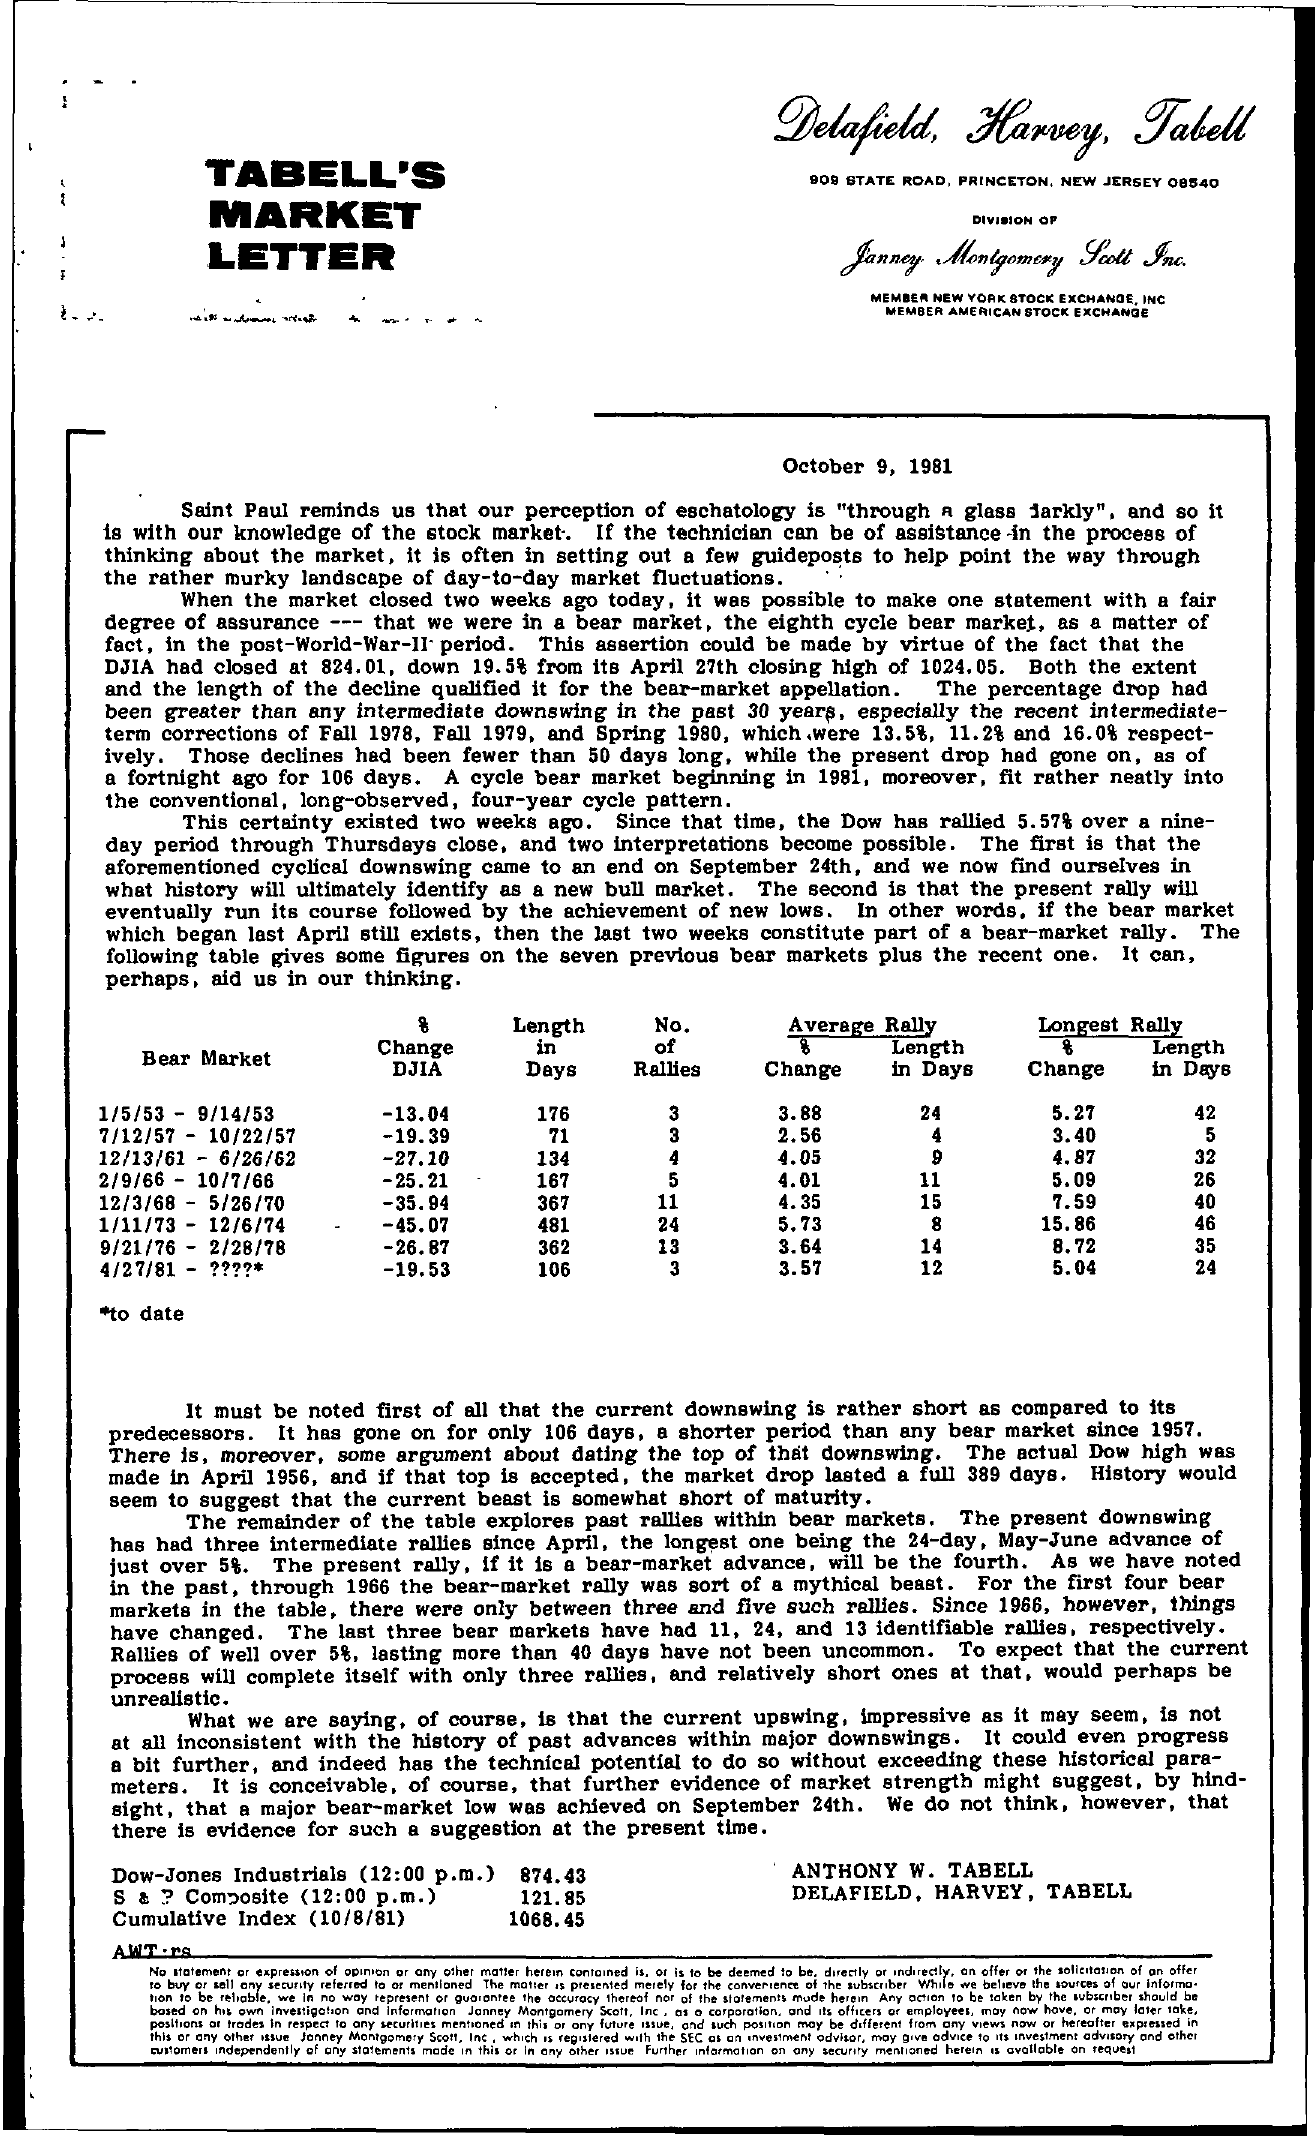 Tabell's Market Letter - October 09, 1981